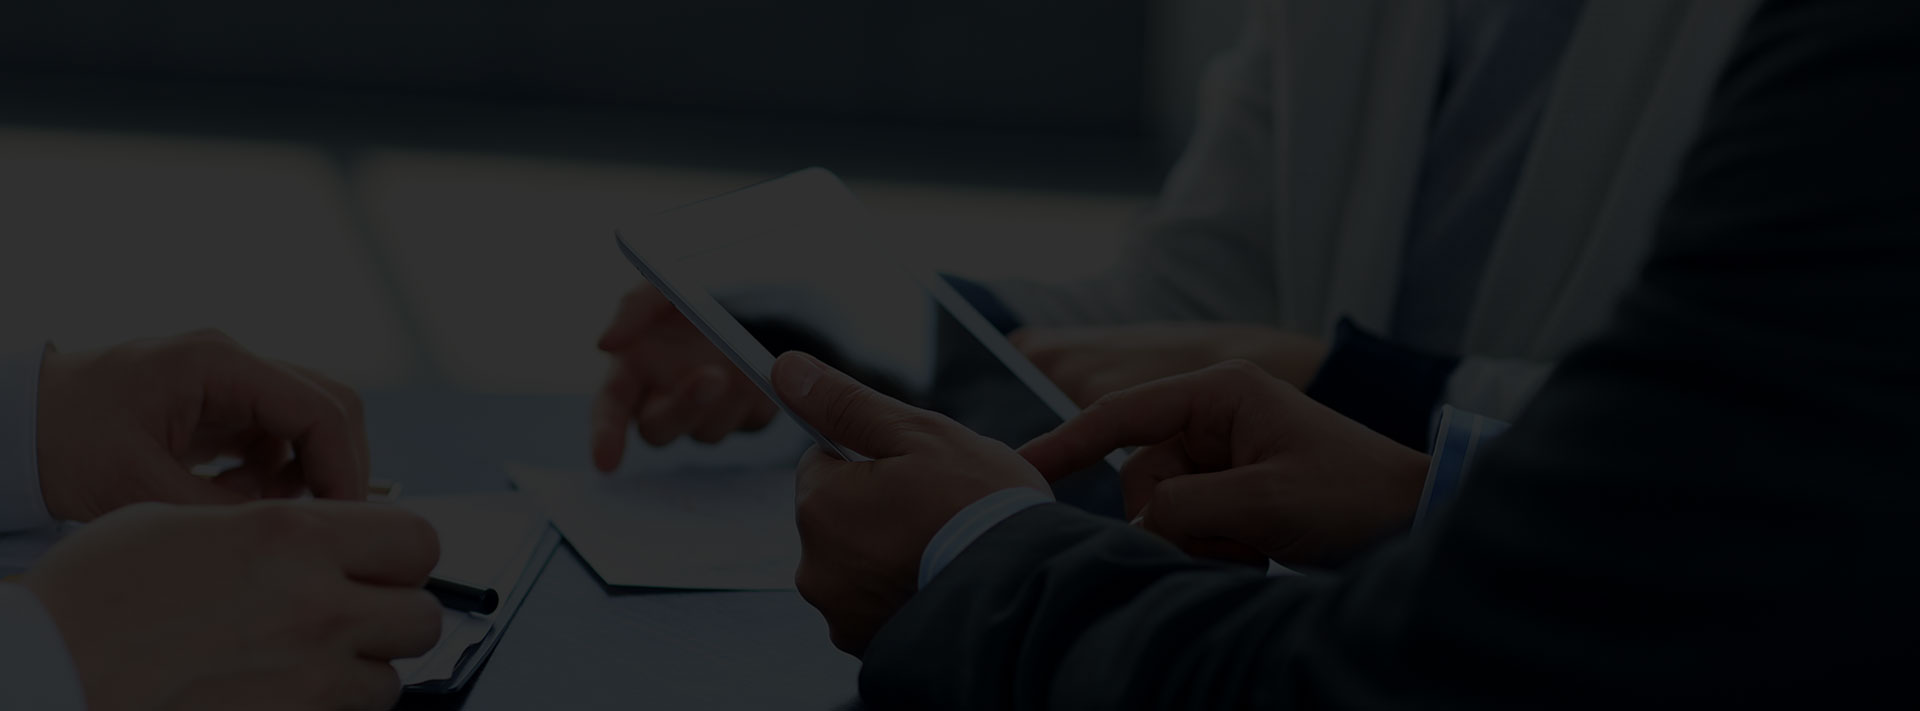 mobile app development company Melbourne